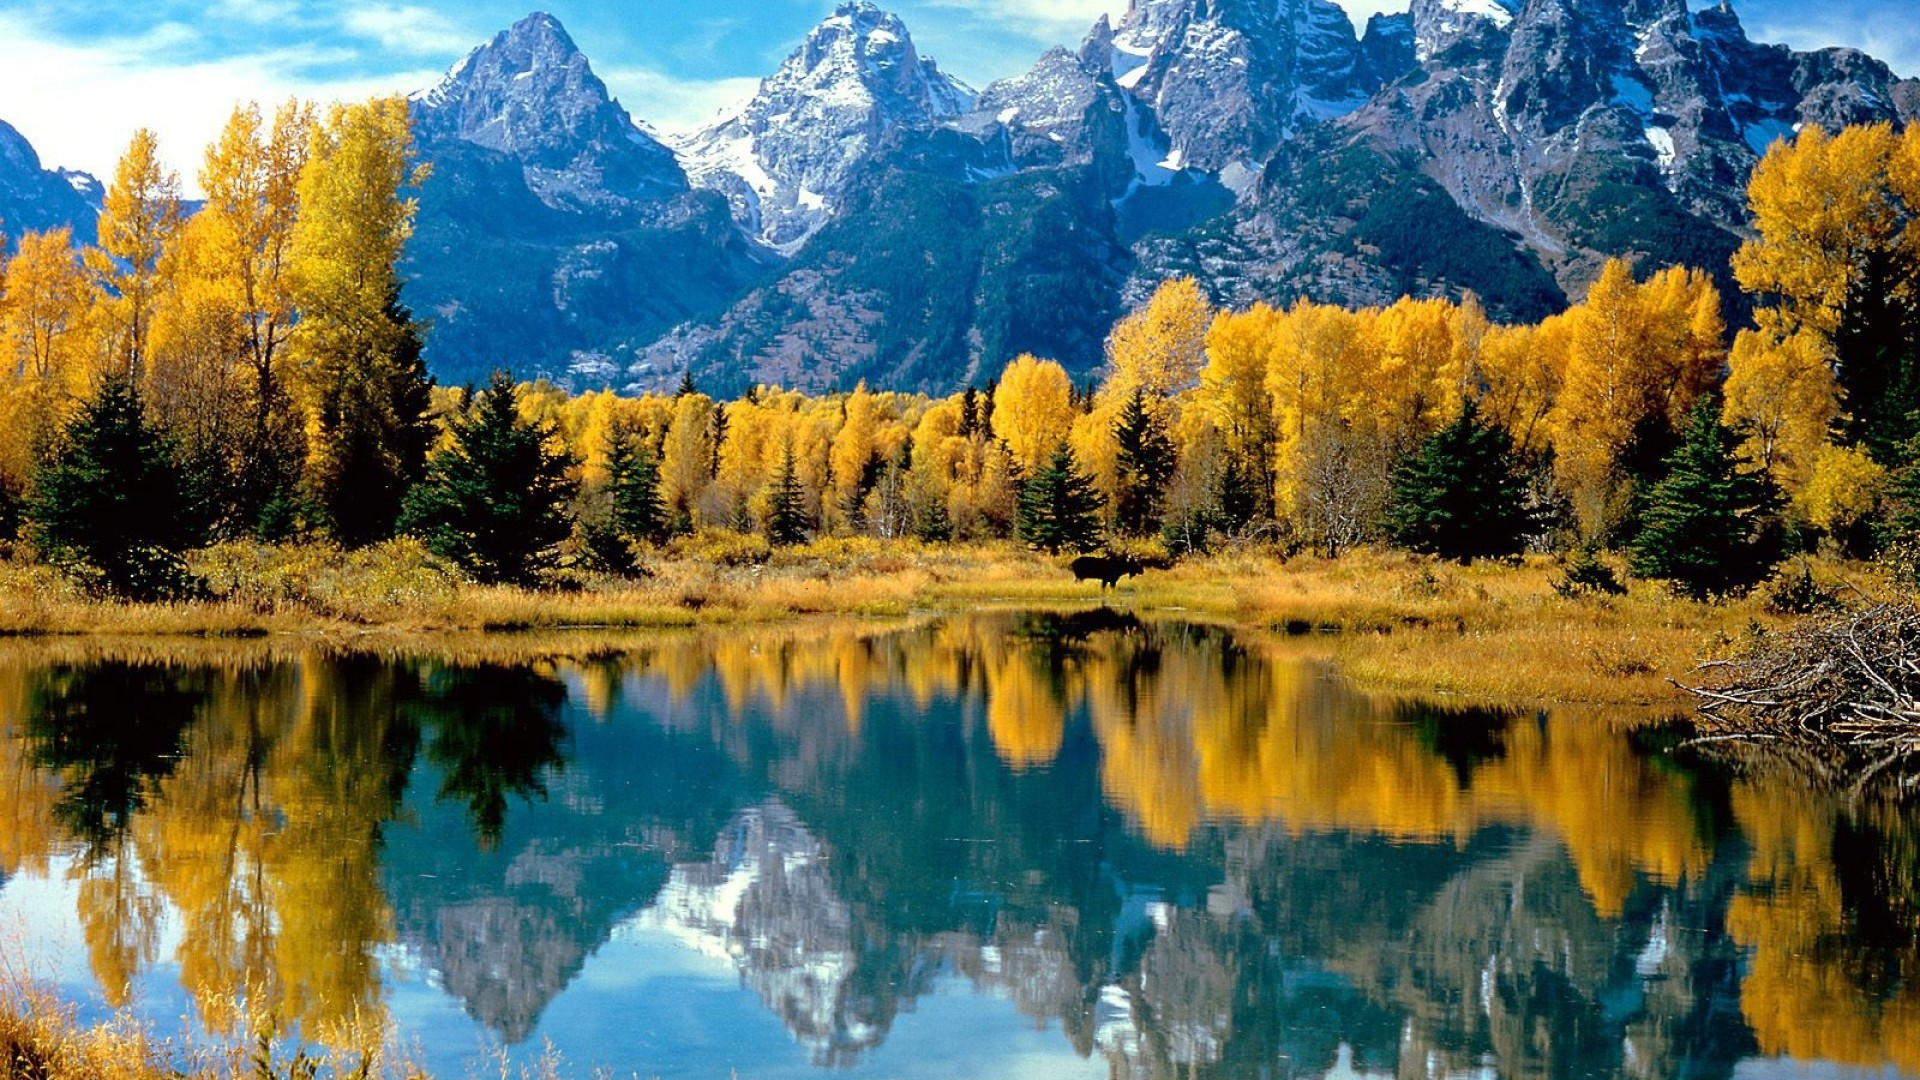 Autumn Mountain Wallpapers 1080p